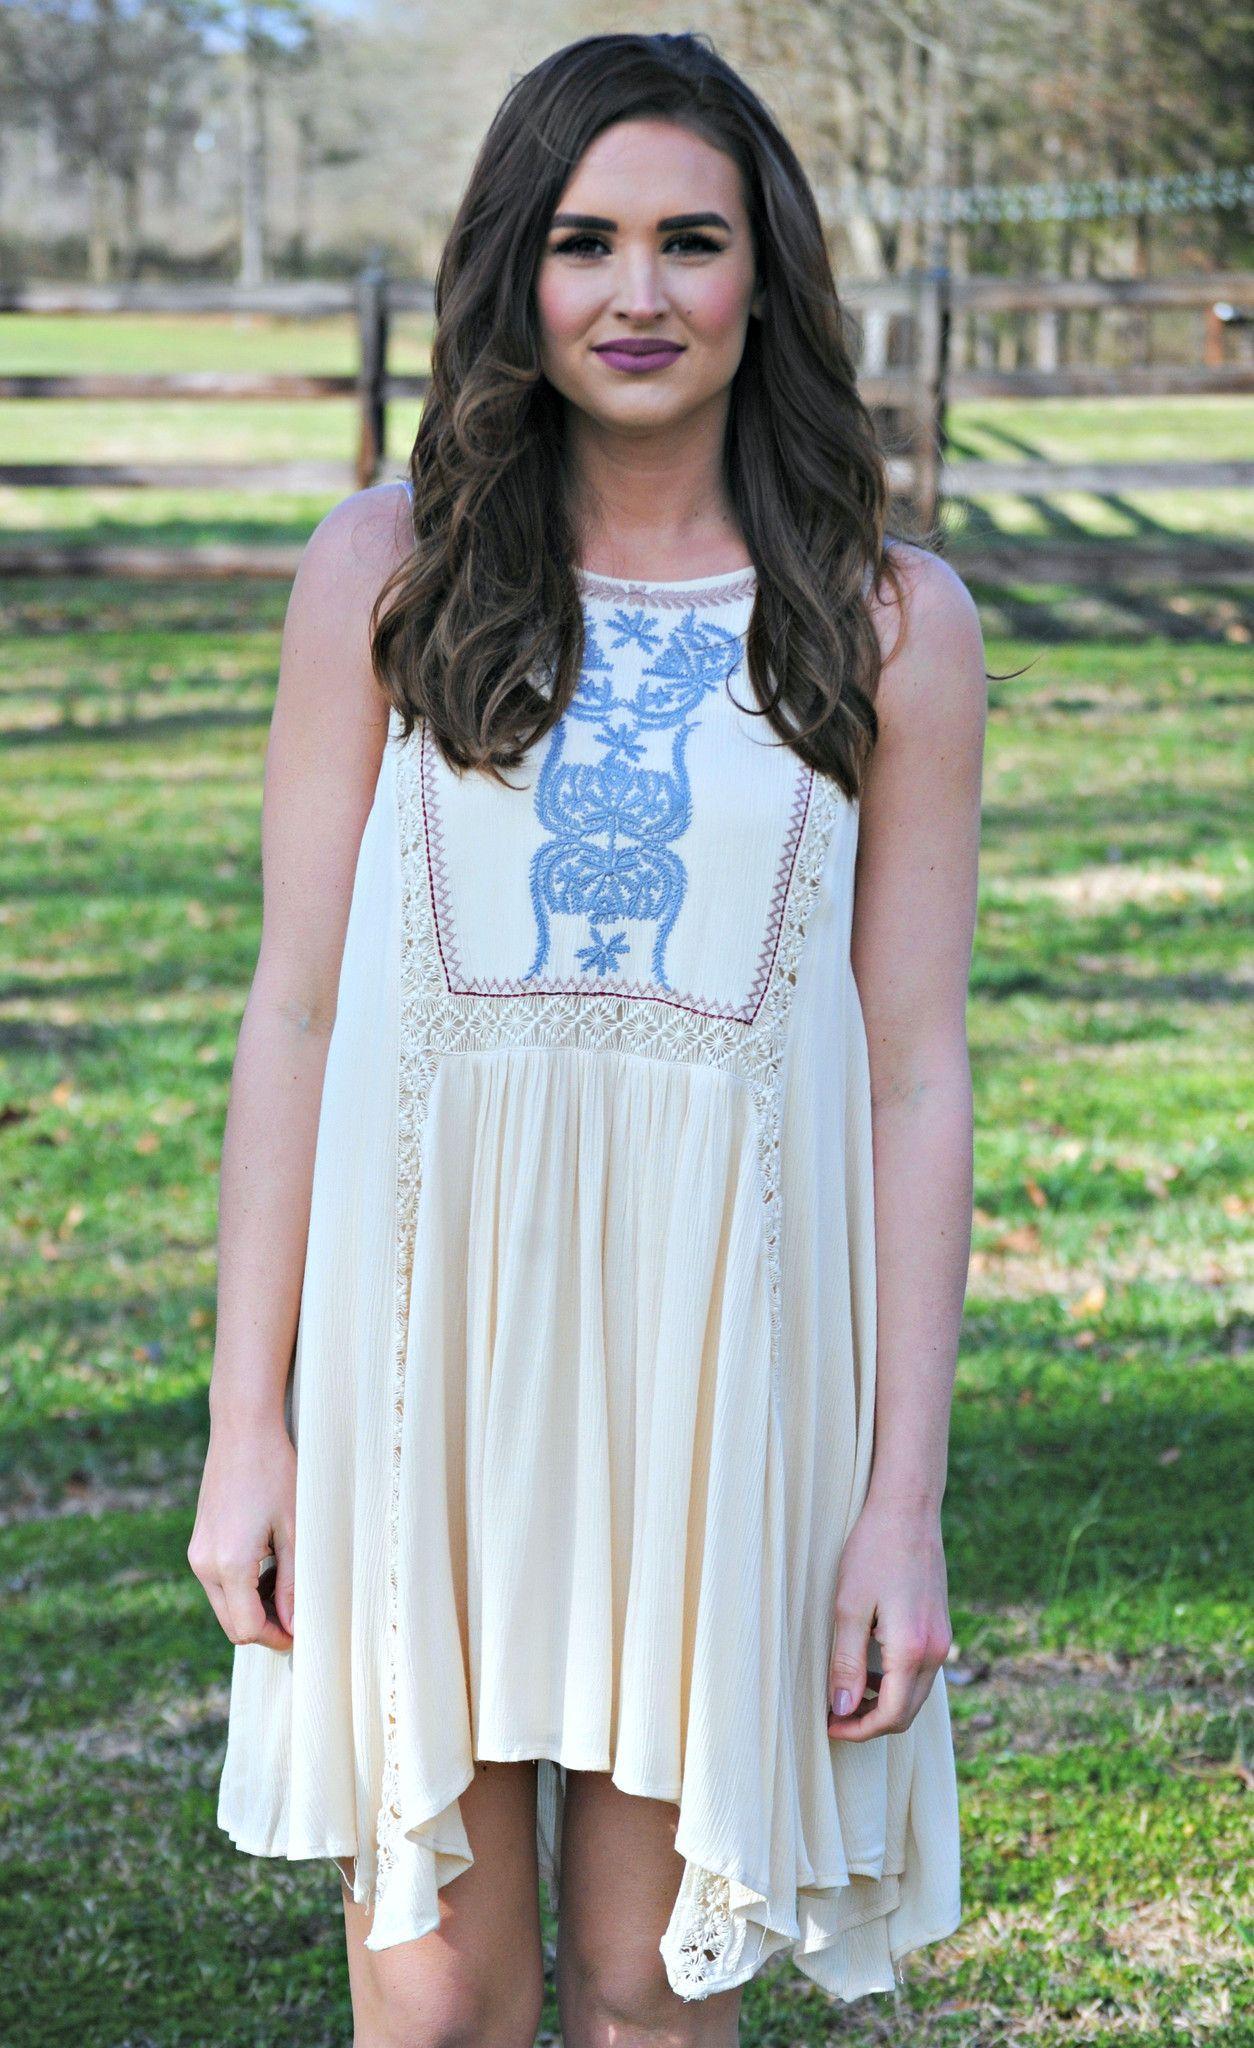 Ivory Embroidered A-Line Dress - Wonderlust Dress